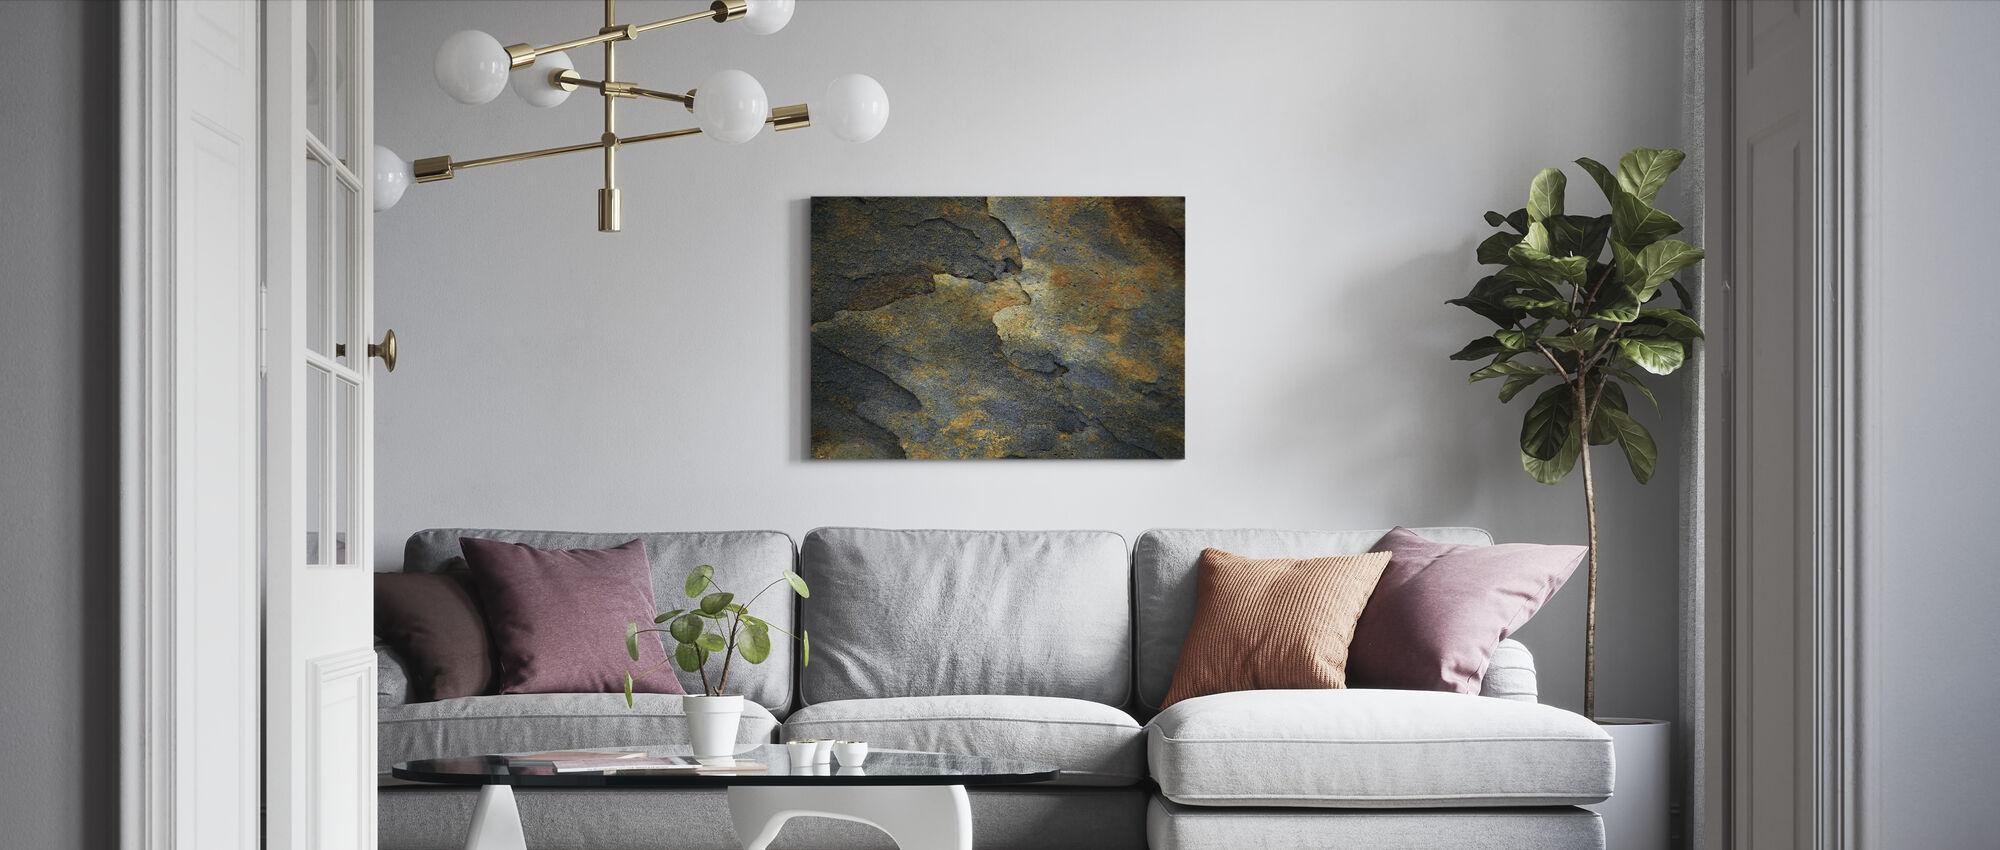 Mineral Rock - Canvas print - Living Room